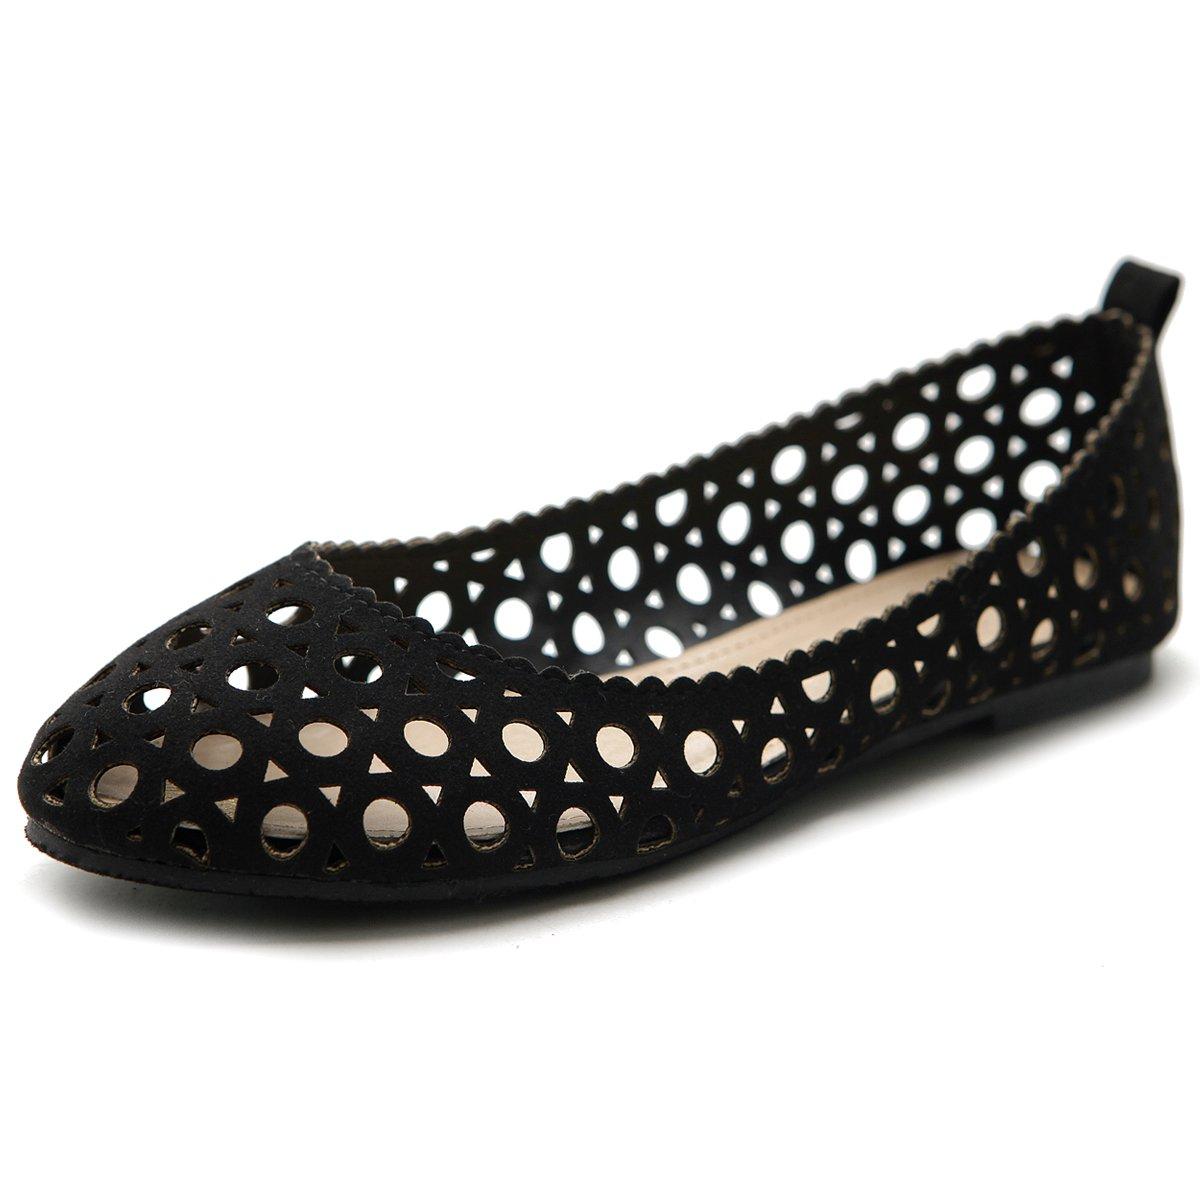 Ollio Women's Shoe Ballet Cut Out Comfort Flat B00NH2BF48 8.5 B(M) US|Black